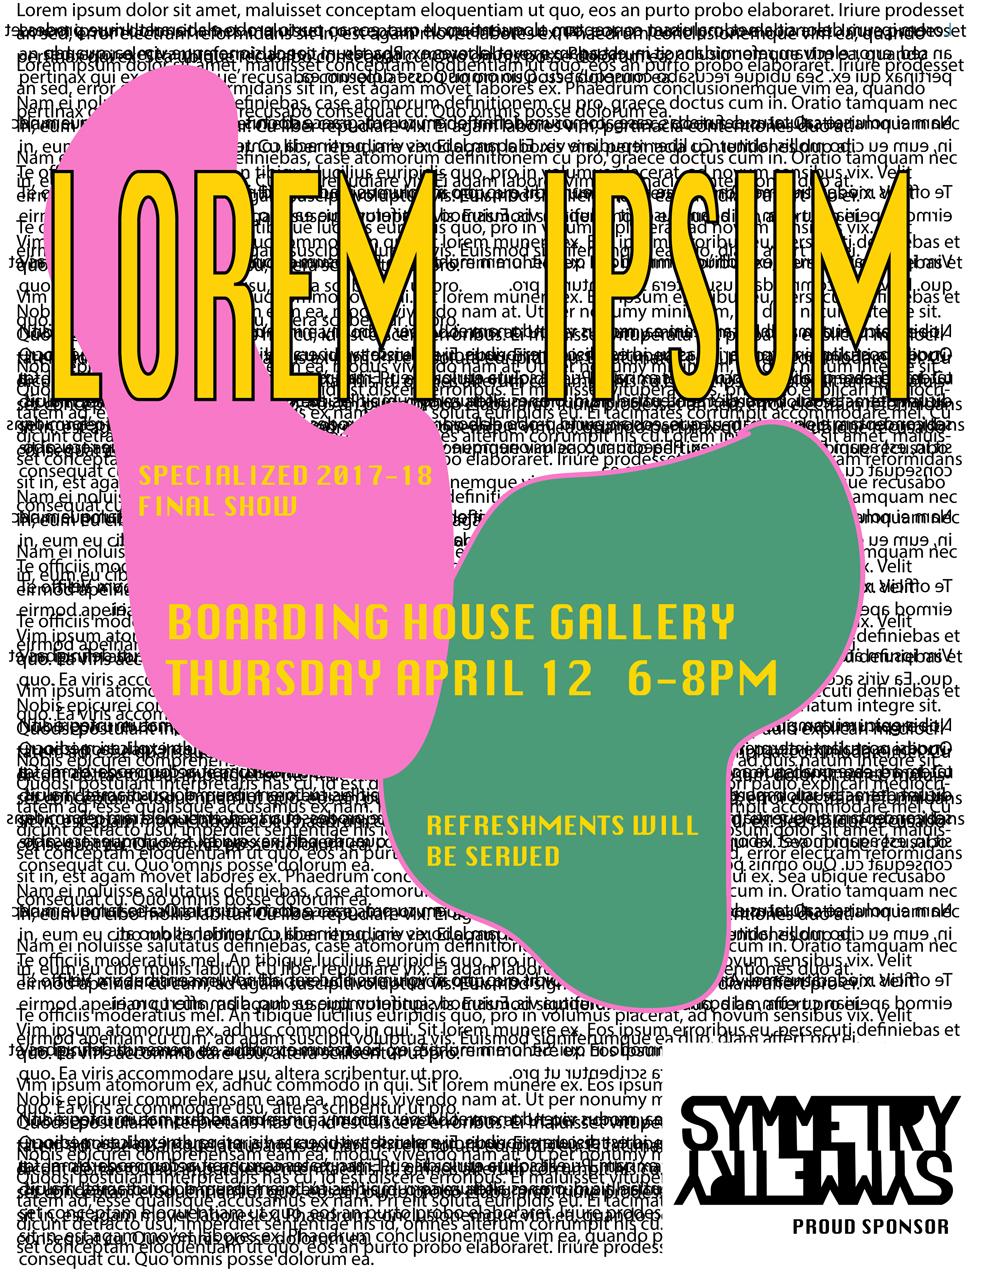 lorem-ipsum-web-poster